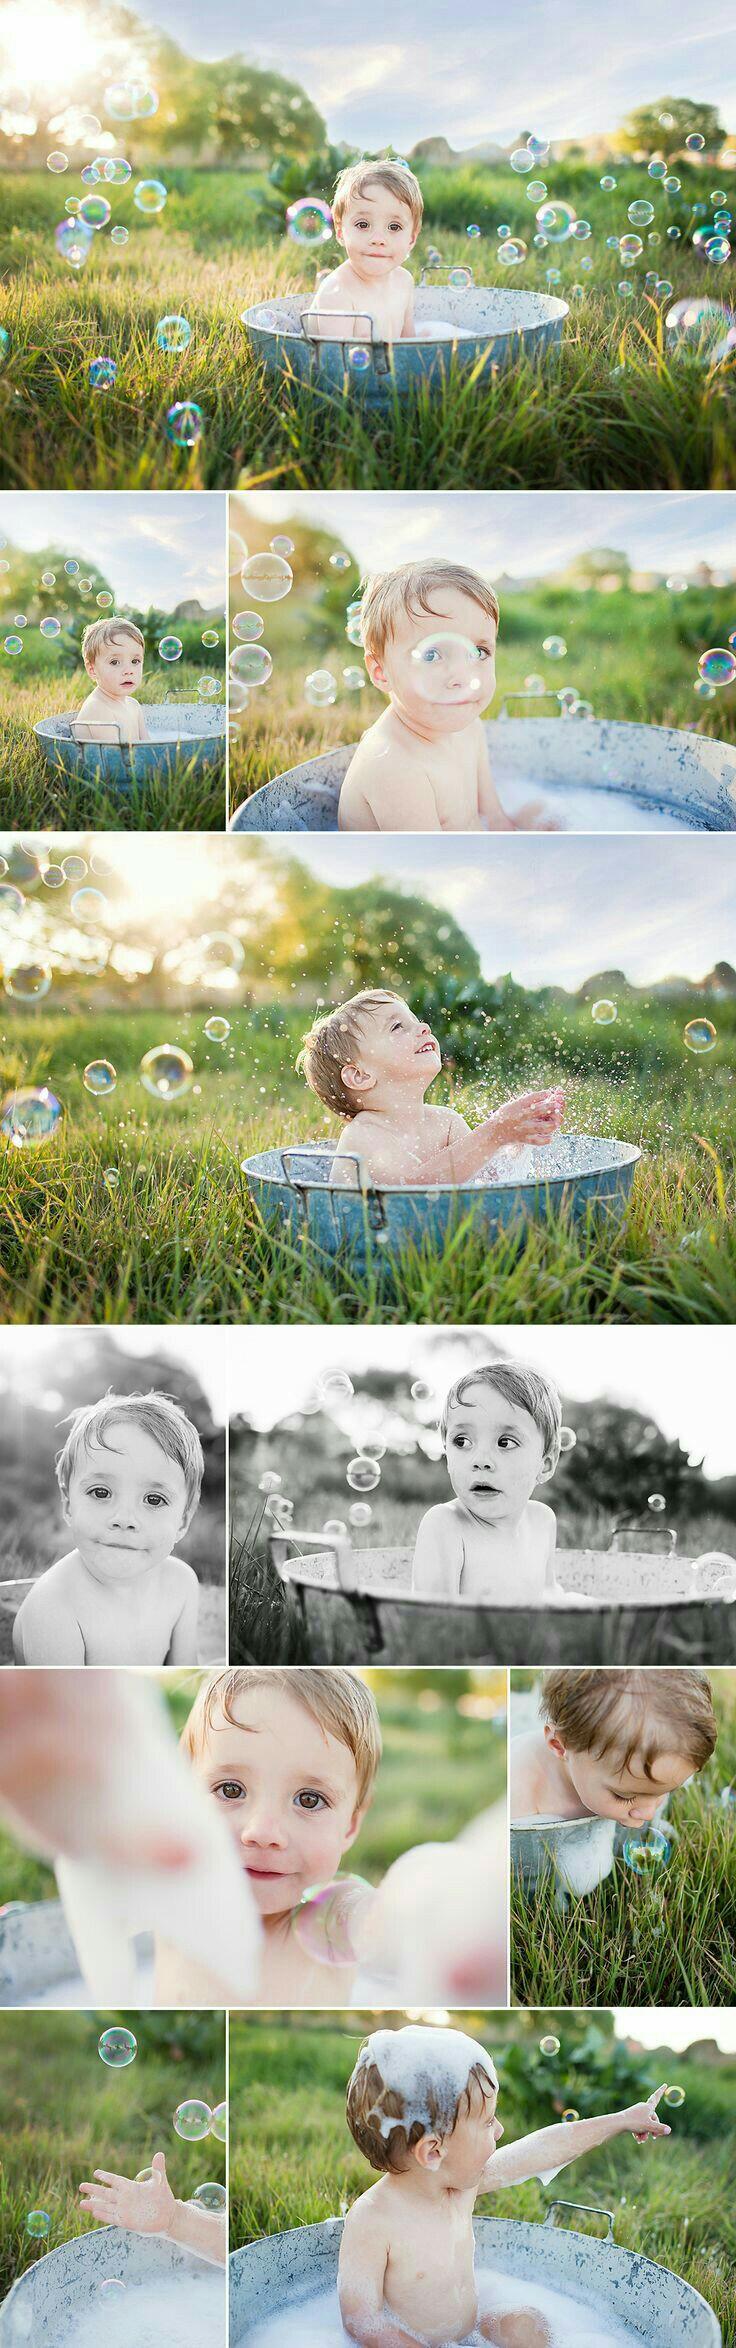 Pin By Lisa Montgomery On Kupanie Children Photography Toddler Photography Baby Photography